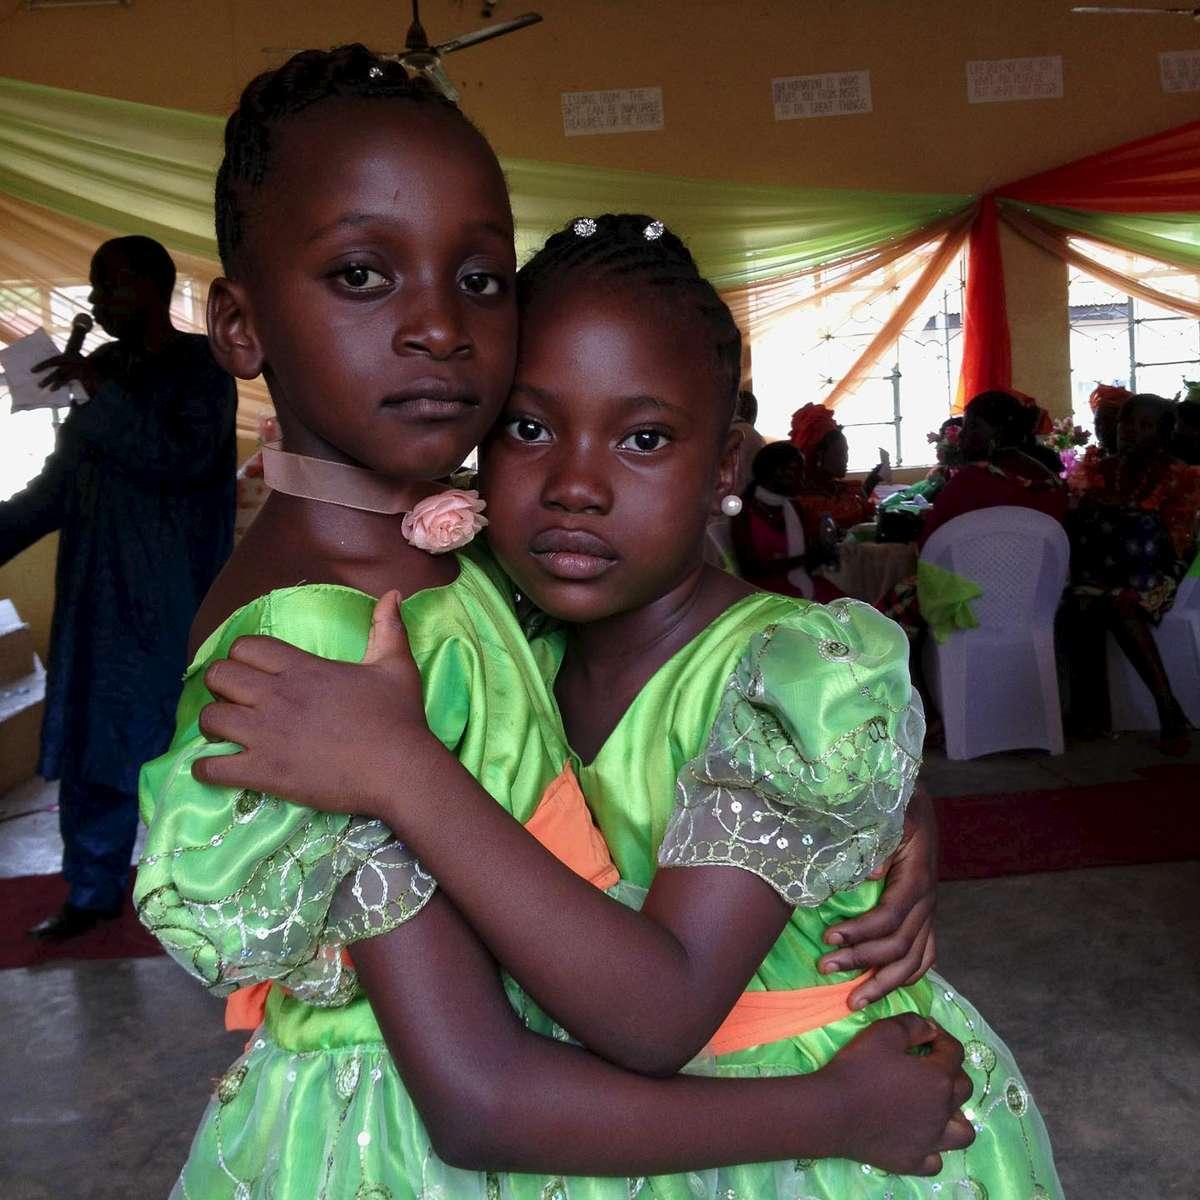 Wedding friends. Jos, Central Nigeria. April 2013.